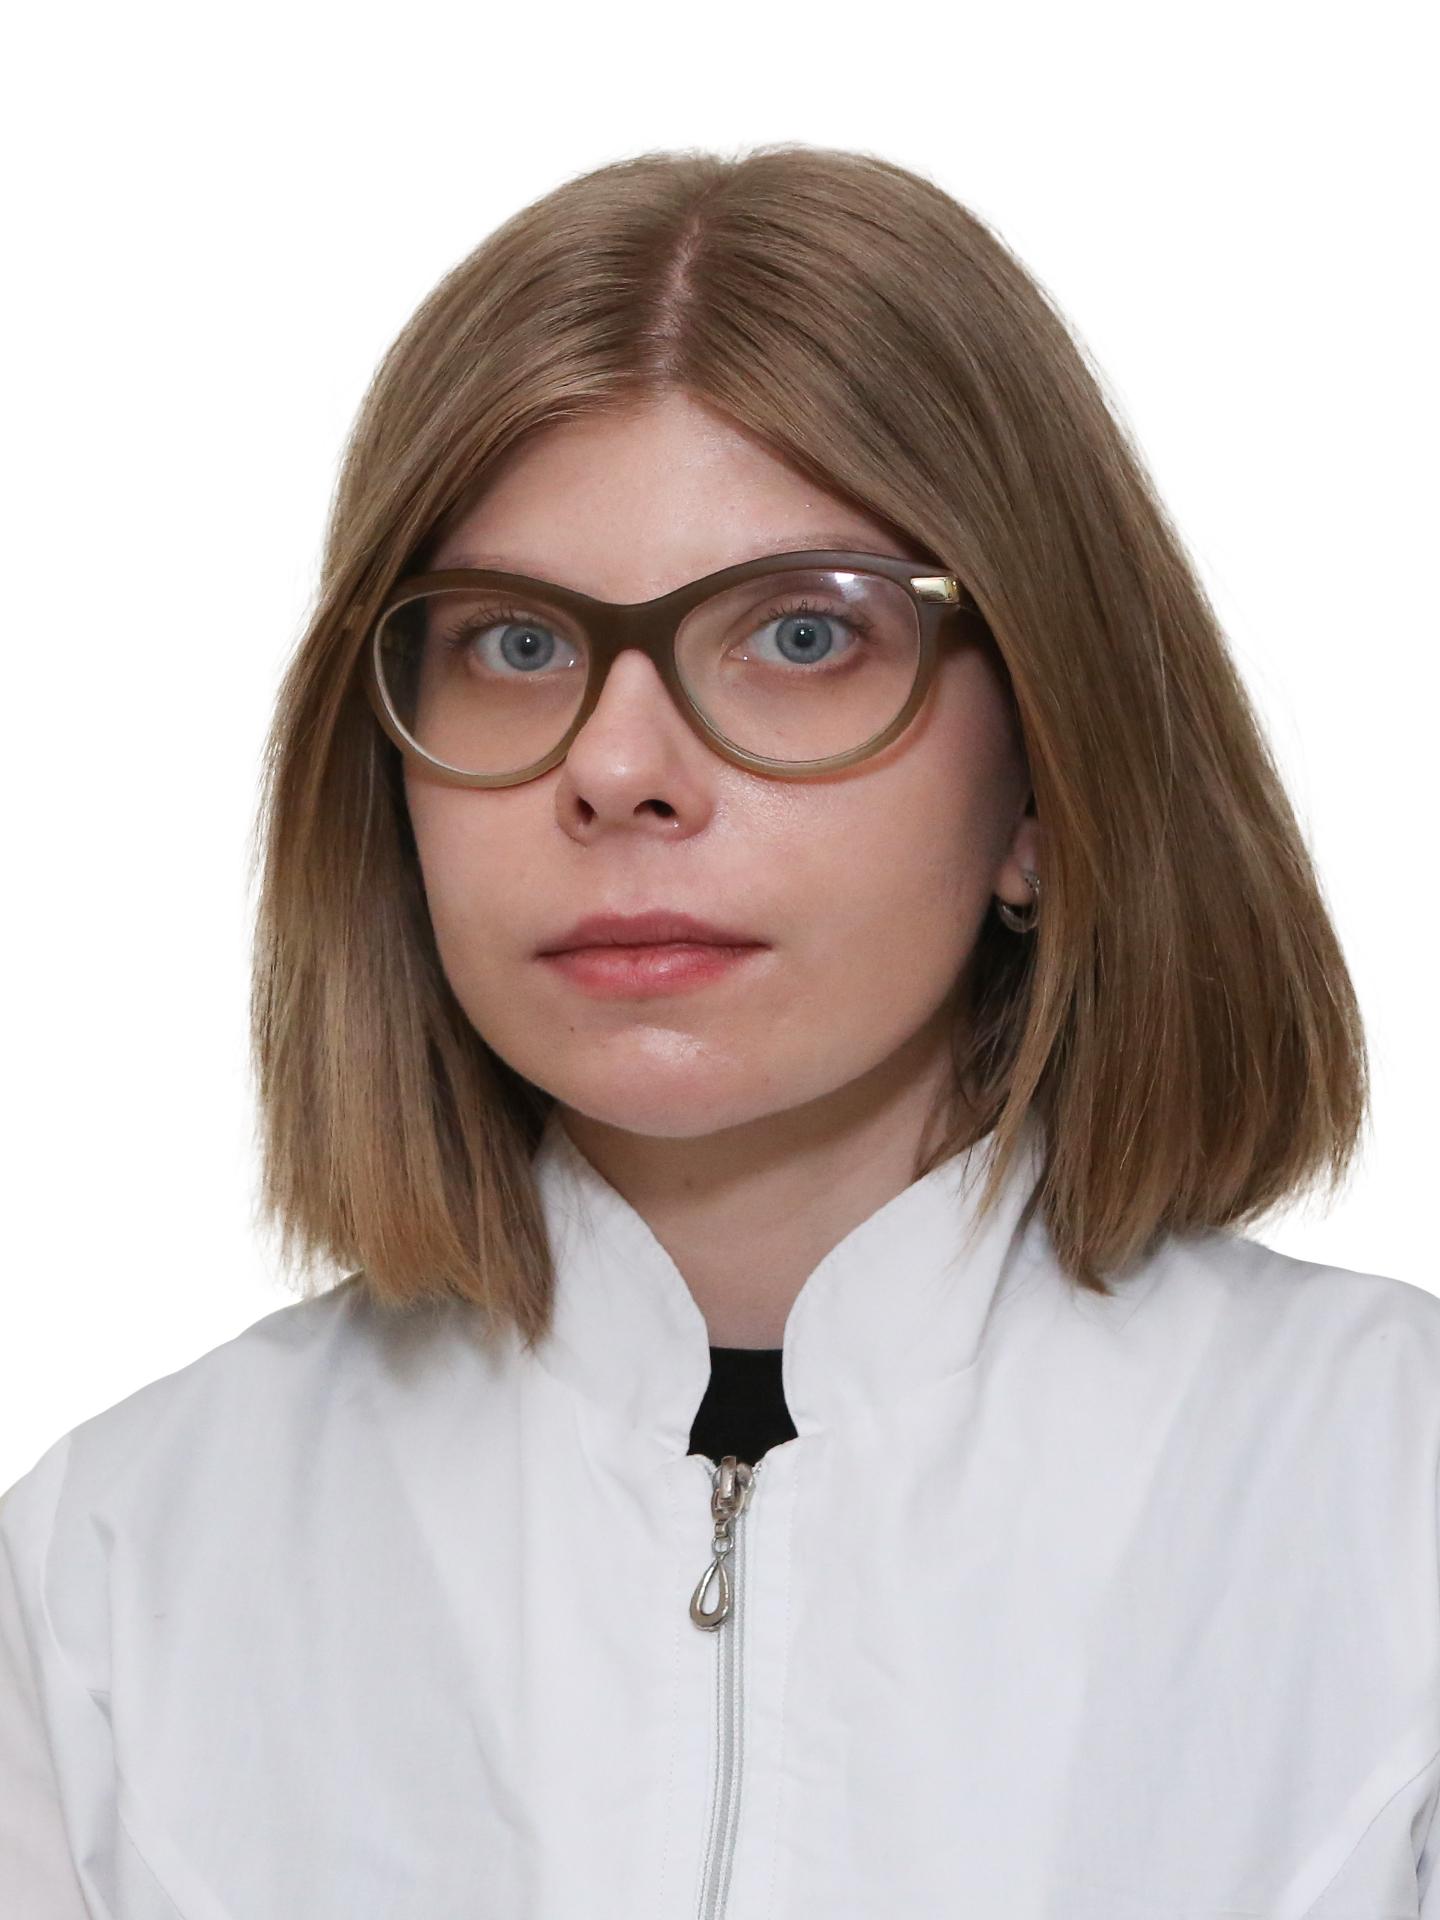 Акимова Екатерина Игоревна